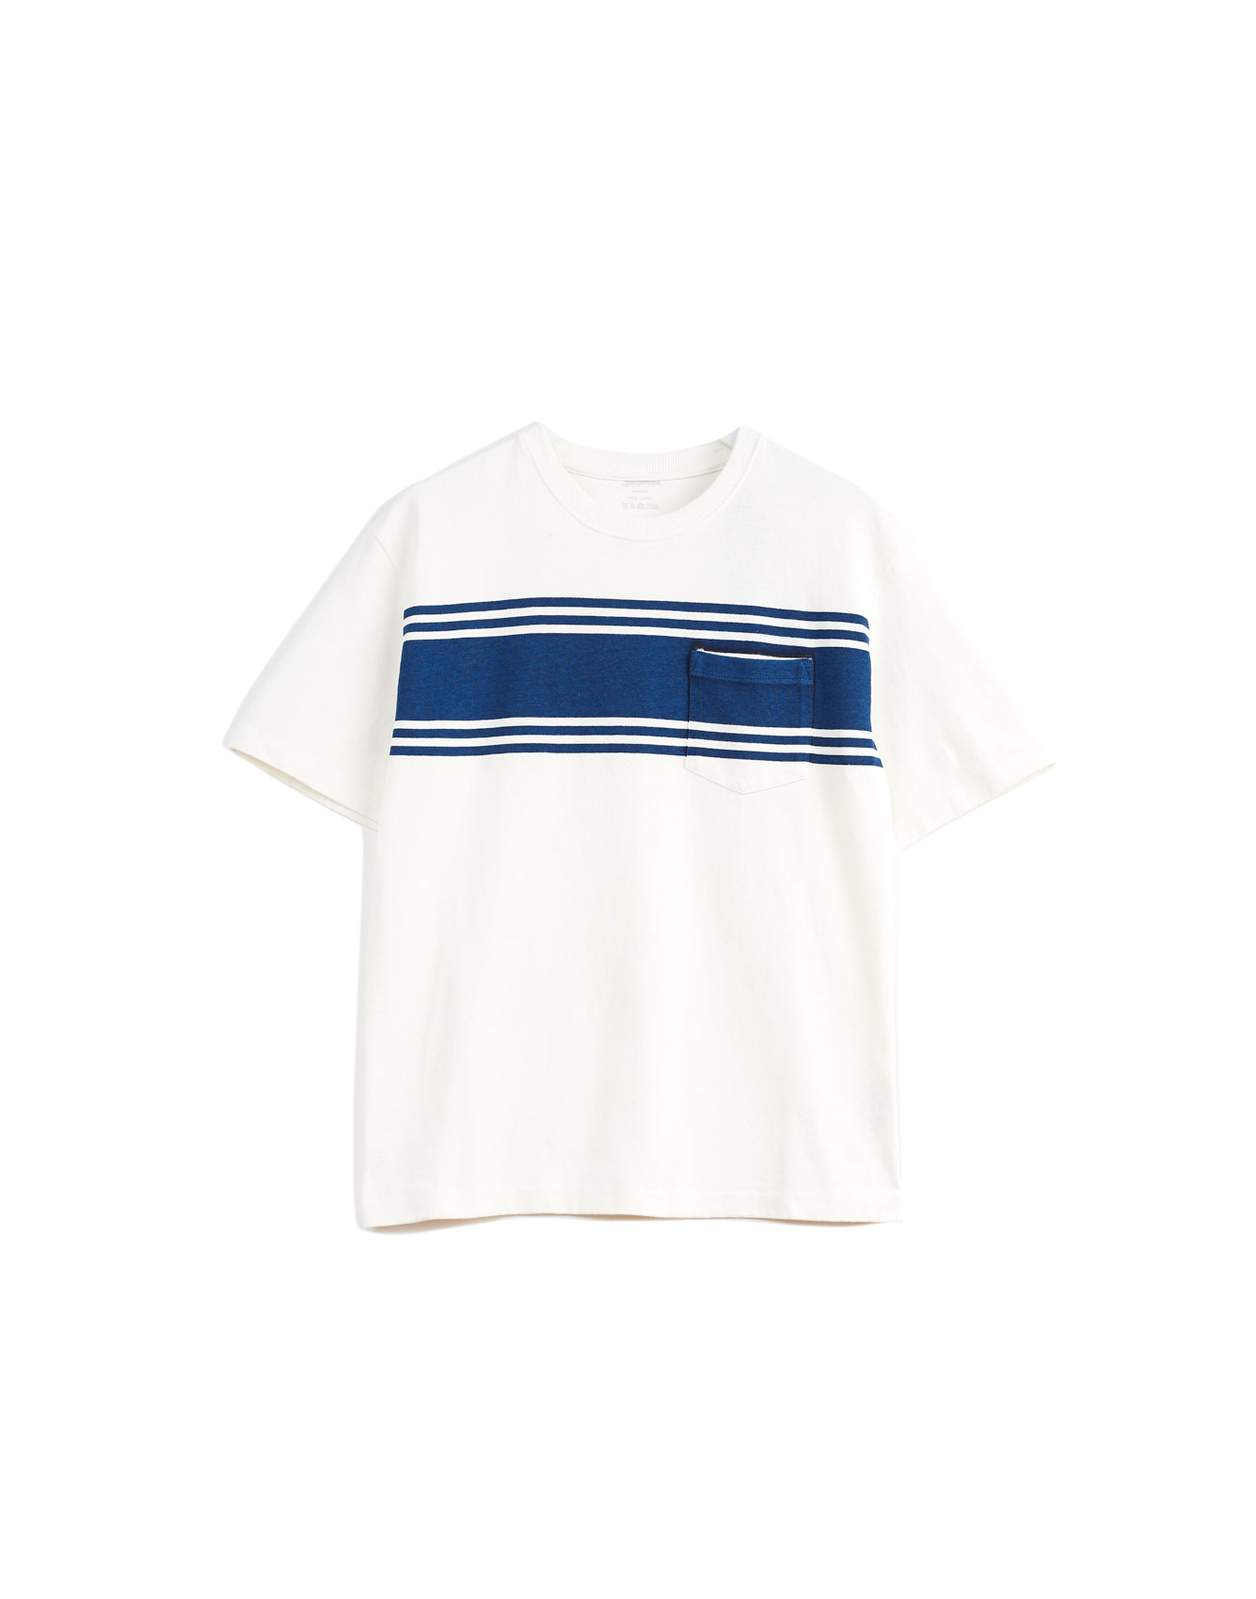 shirt_fluz_snow_1_1_1_1600x1600.jpg